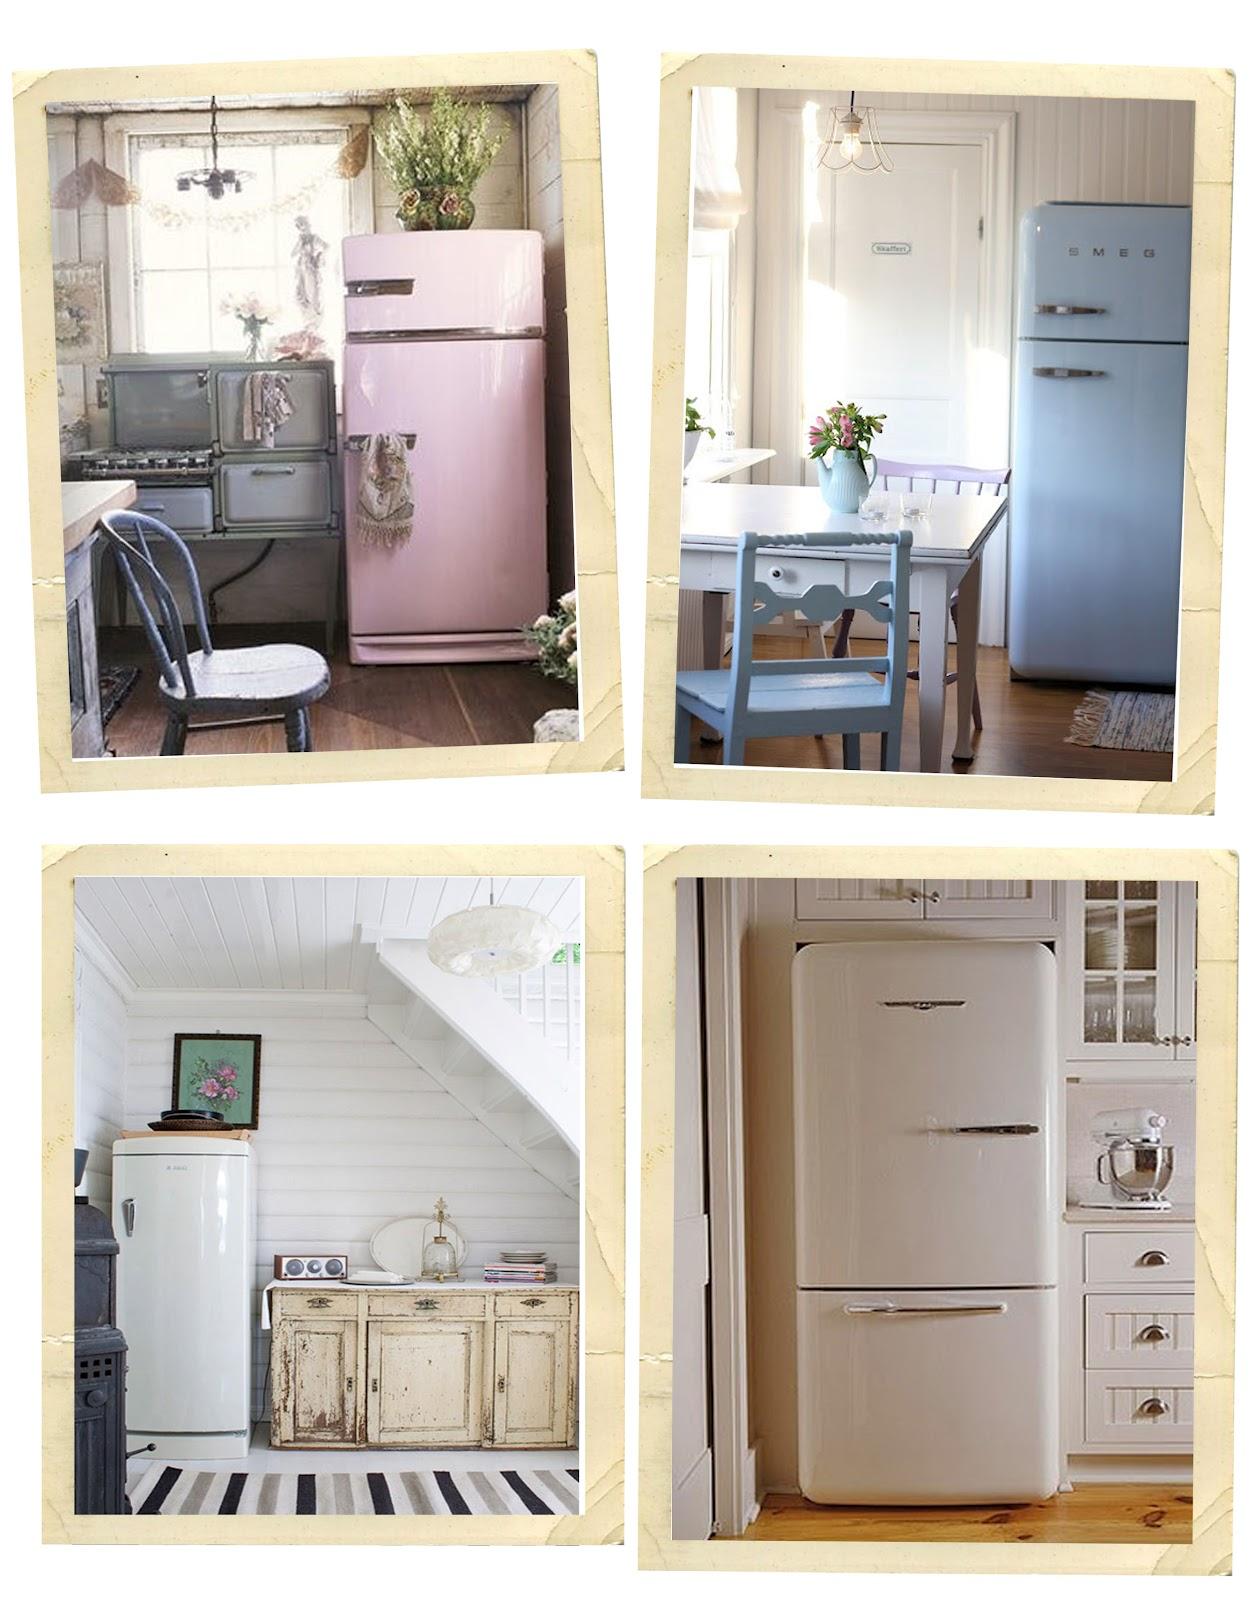 Preferenza shabby freak: Un frigorifero nuovo KY15